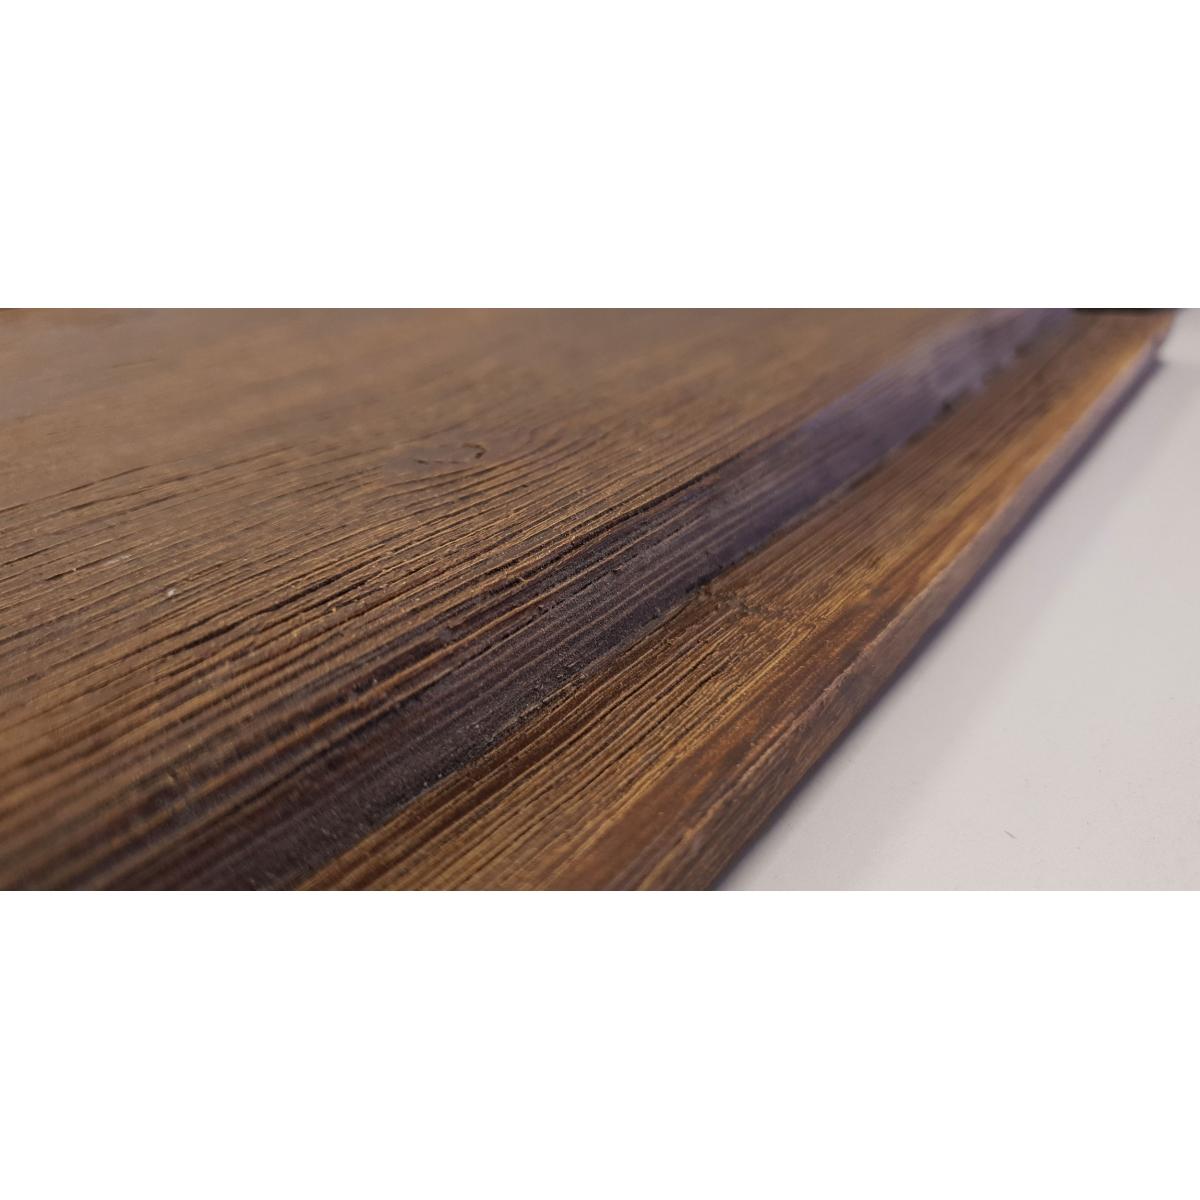 Grupo Unamacor Paneles imitación madera de poliuretano